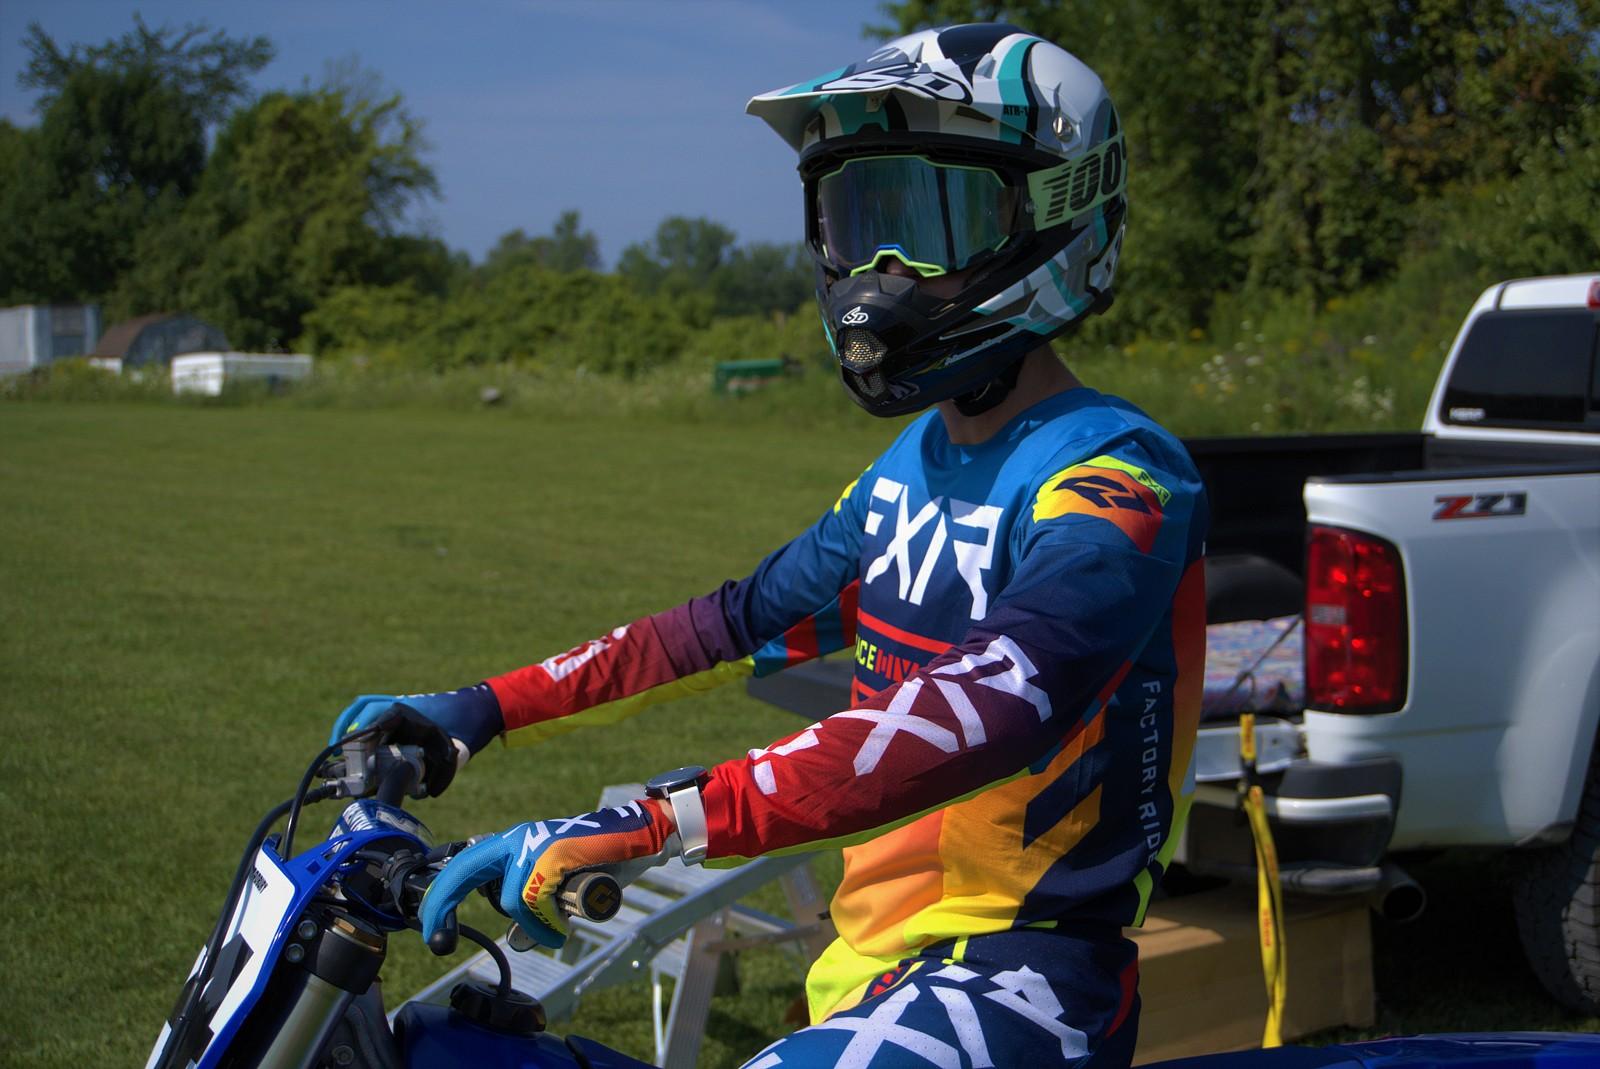 Photo 2 - DawsonBMX54 - Motocross Pictures - Vital MX